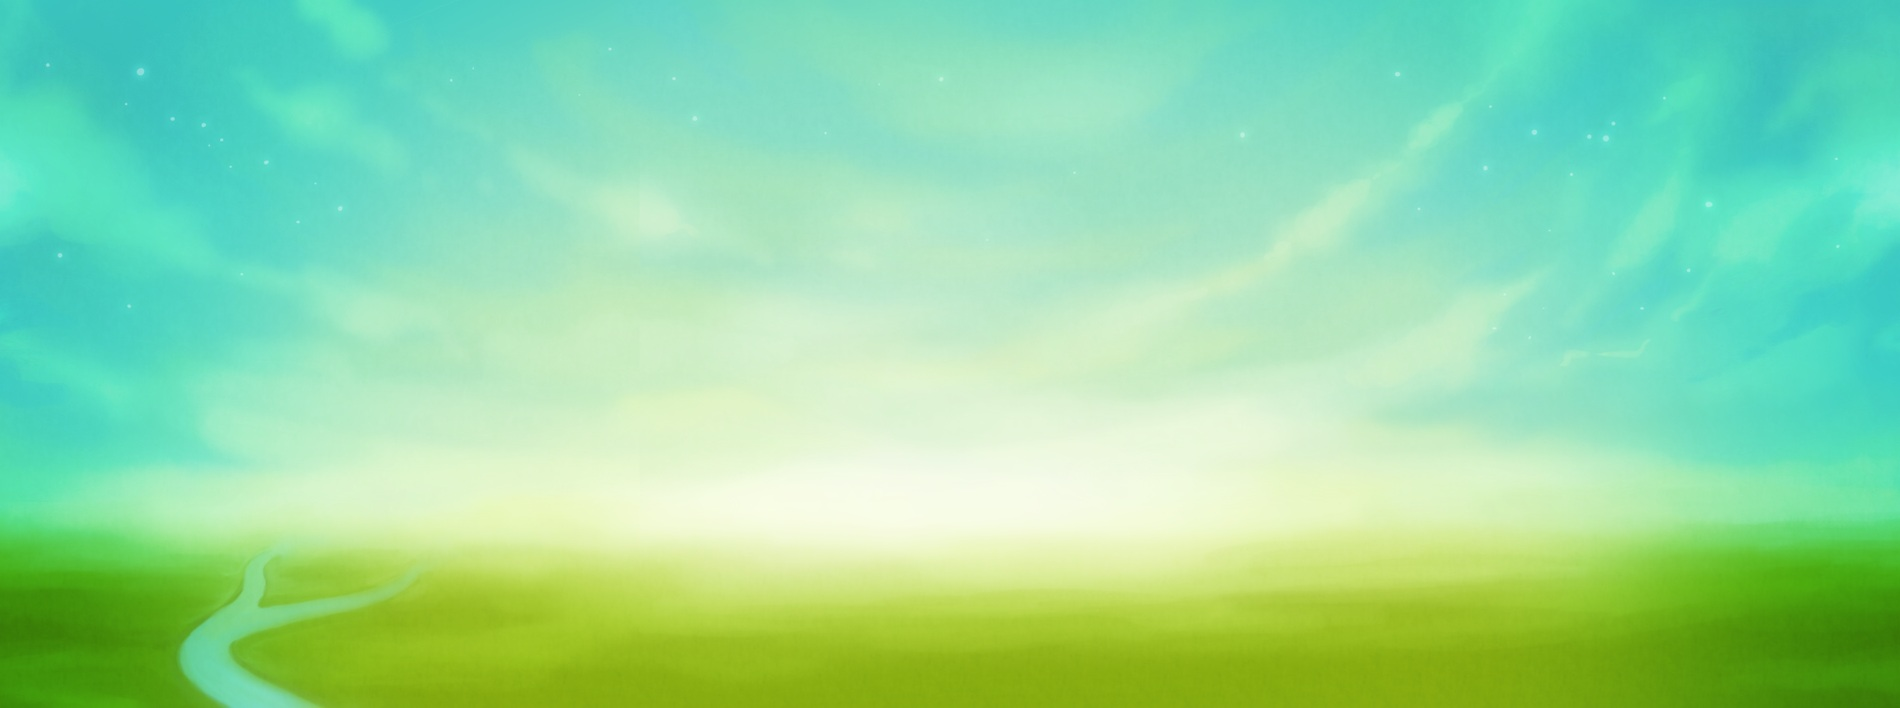 Plain background by wangqr 1900x708